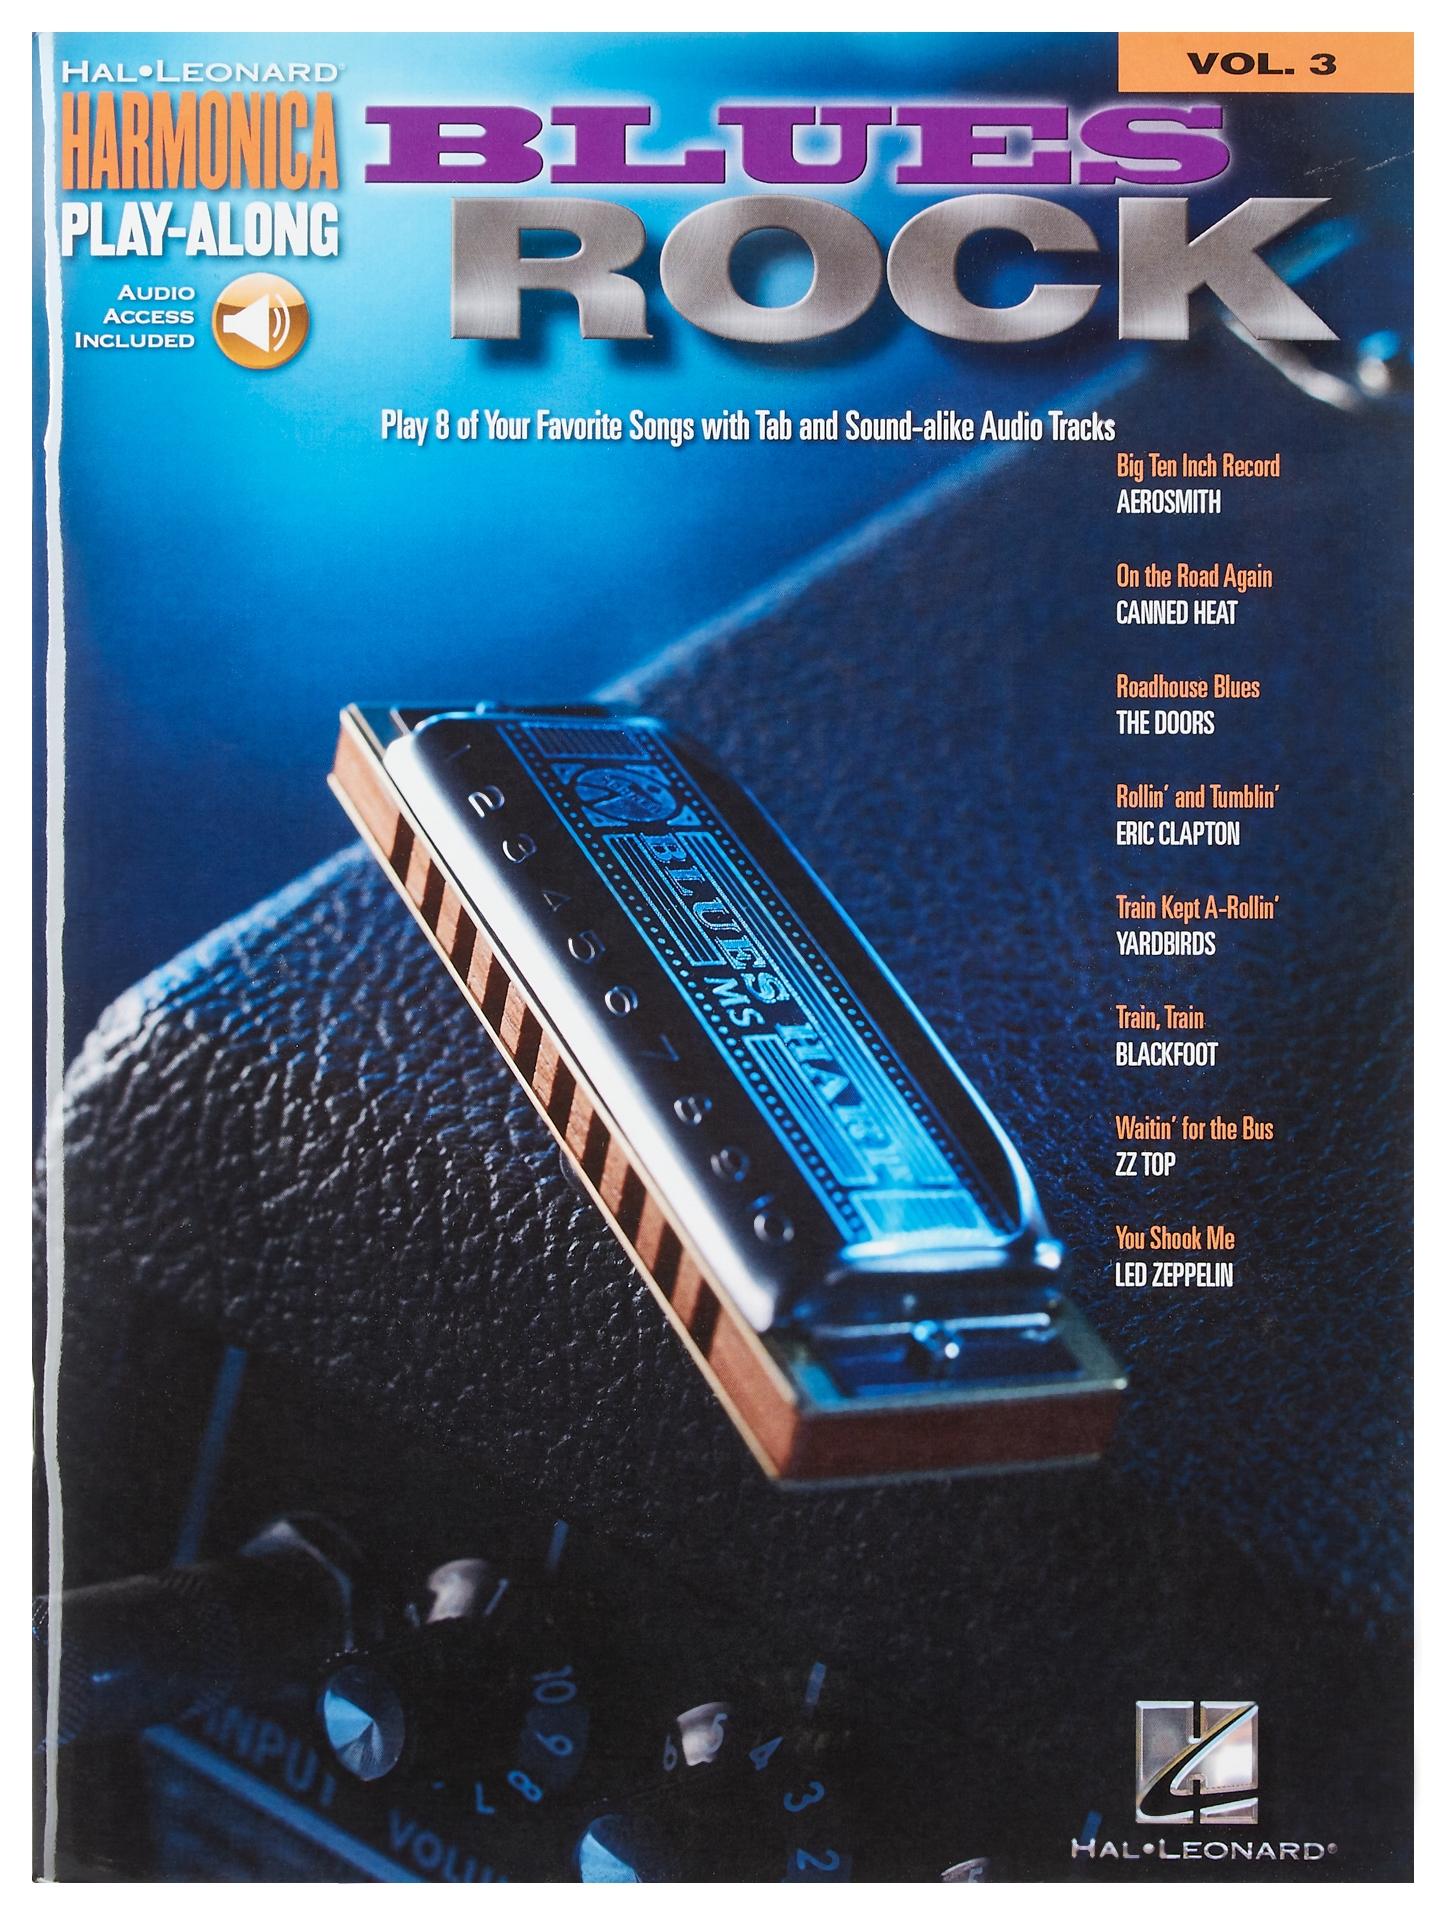 MS Harmonica Play-Along Volume 3: Blues Rock